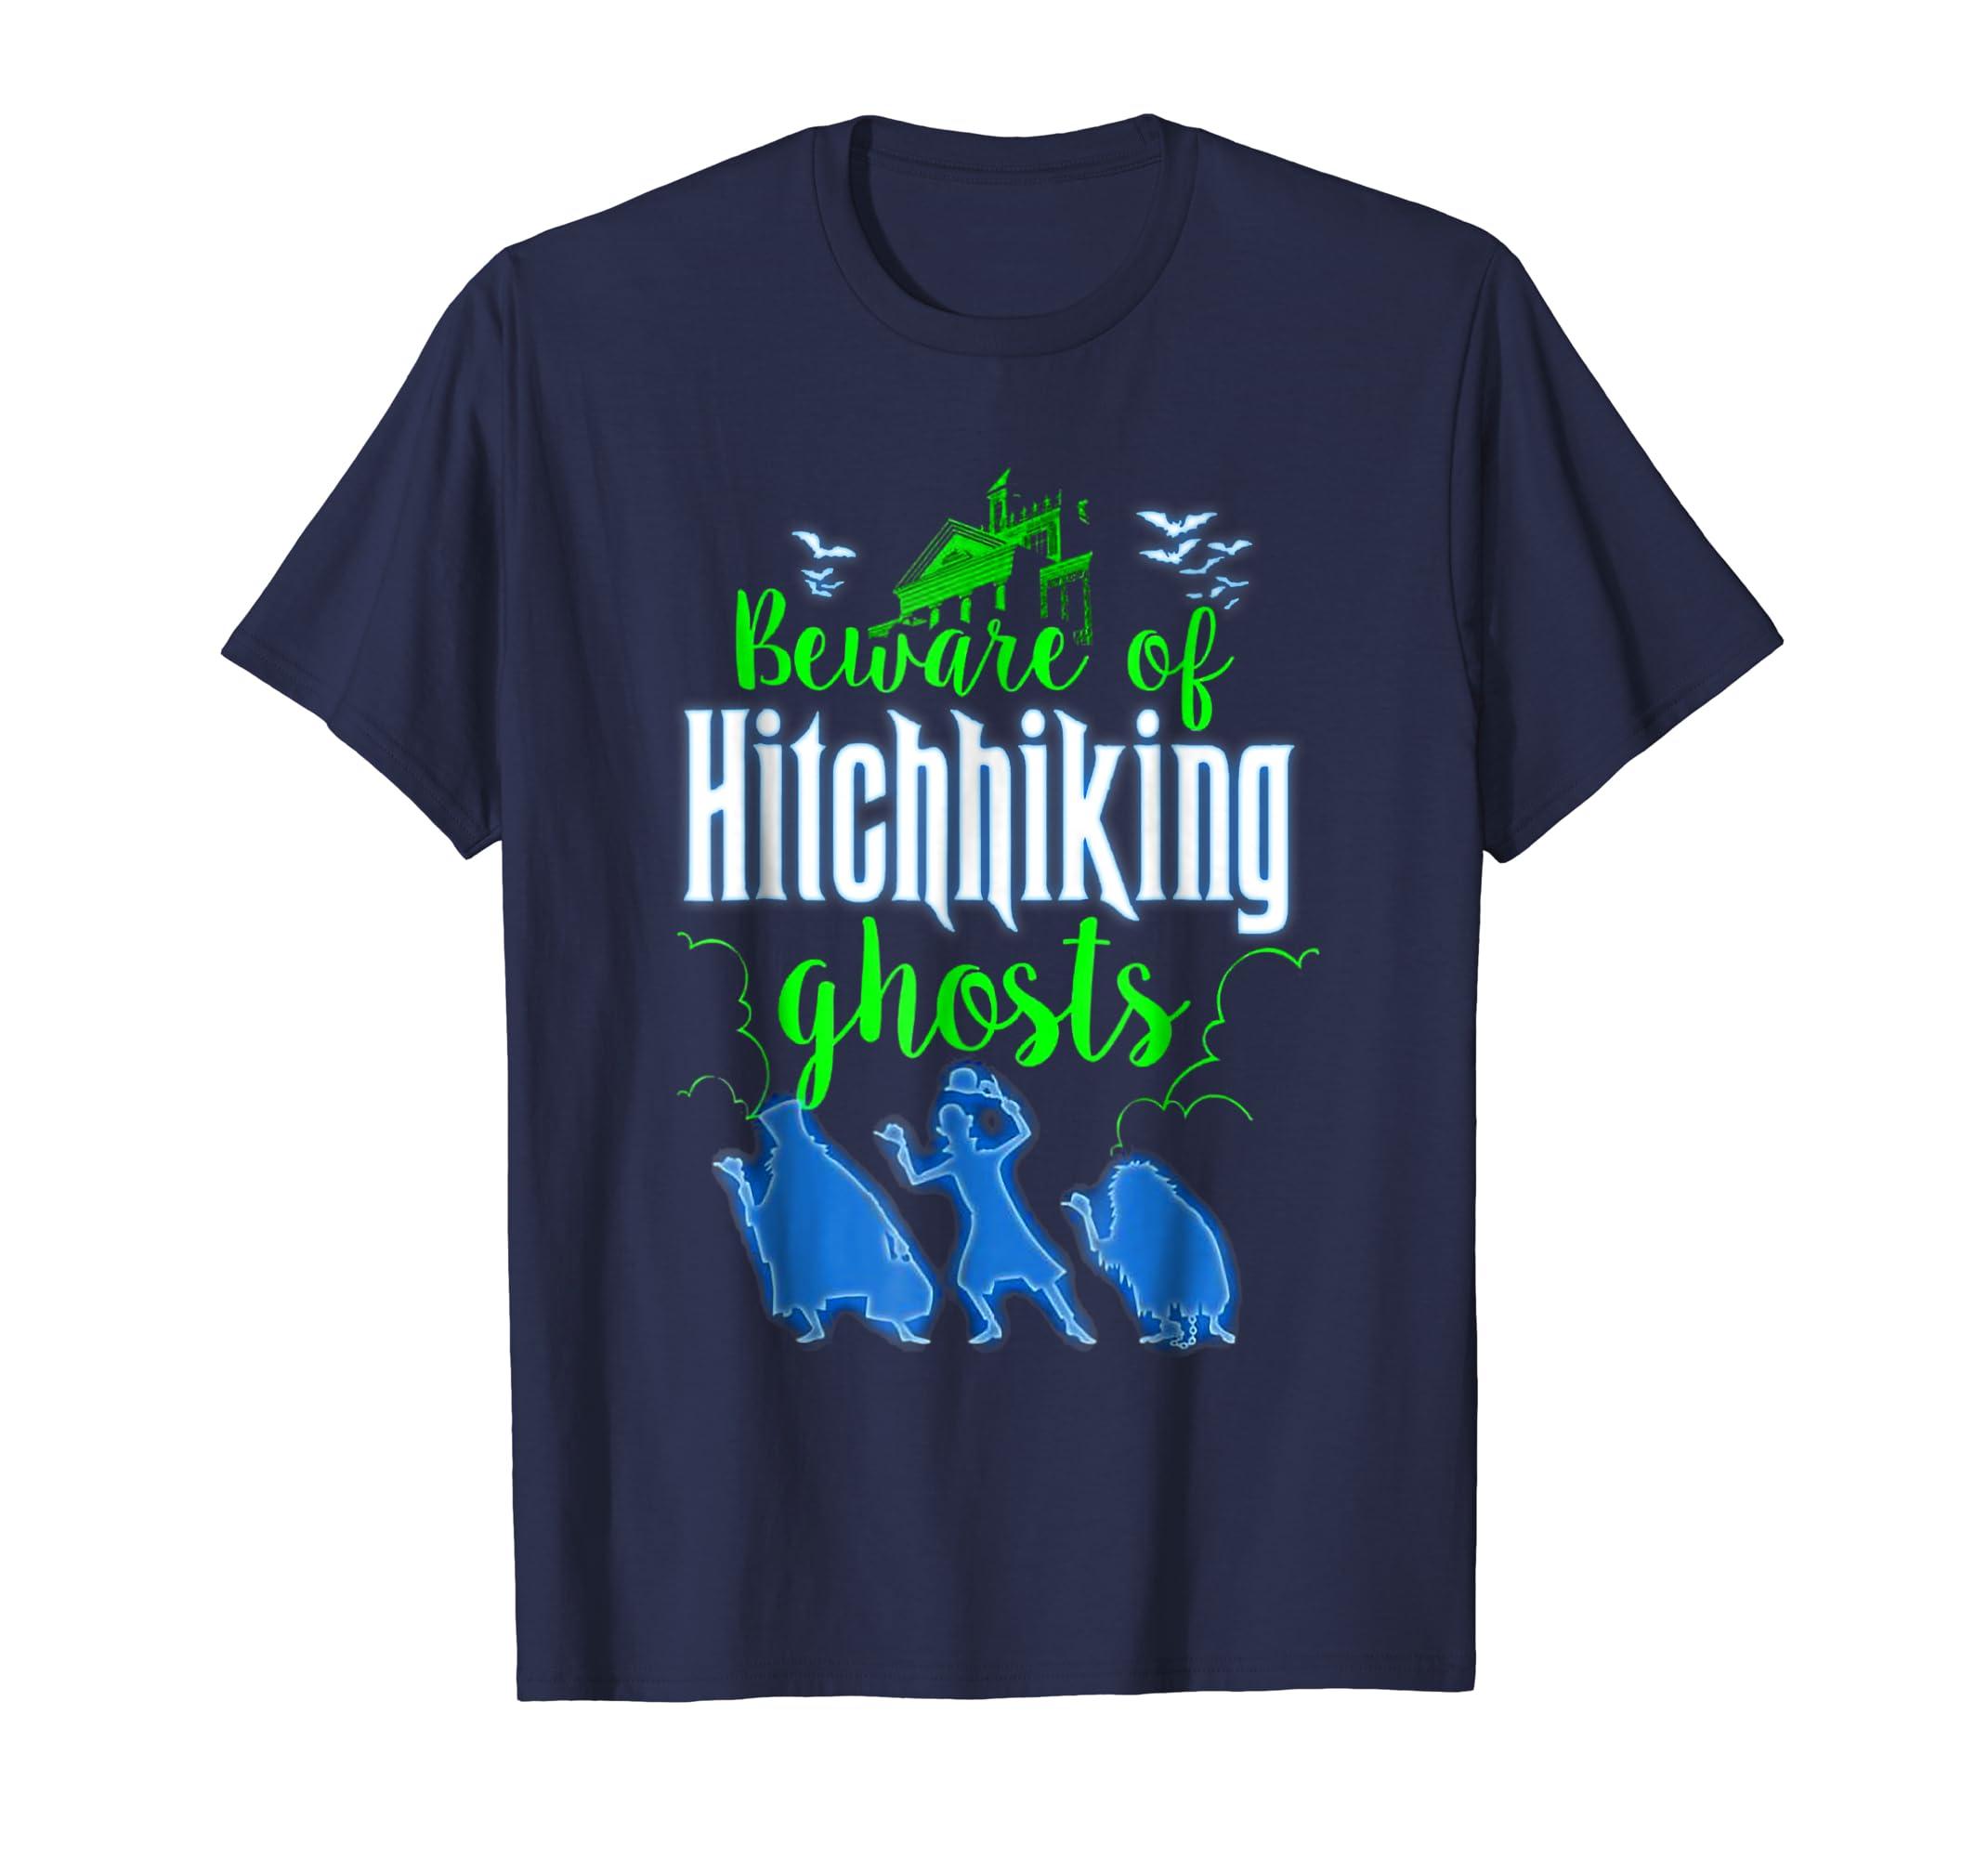 Beware Of Hitchhiking Ghosts Halloween Costume Funny Shirt-Teesml